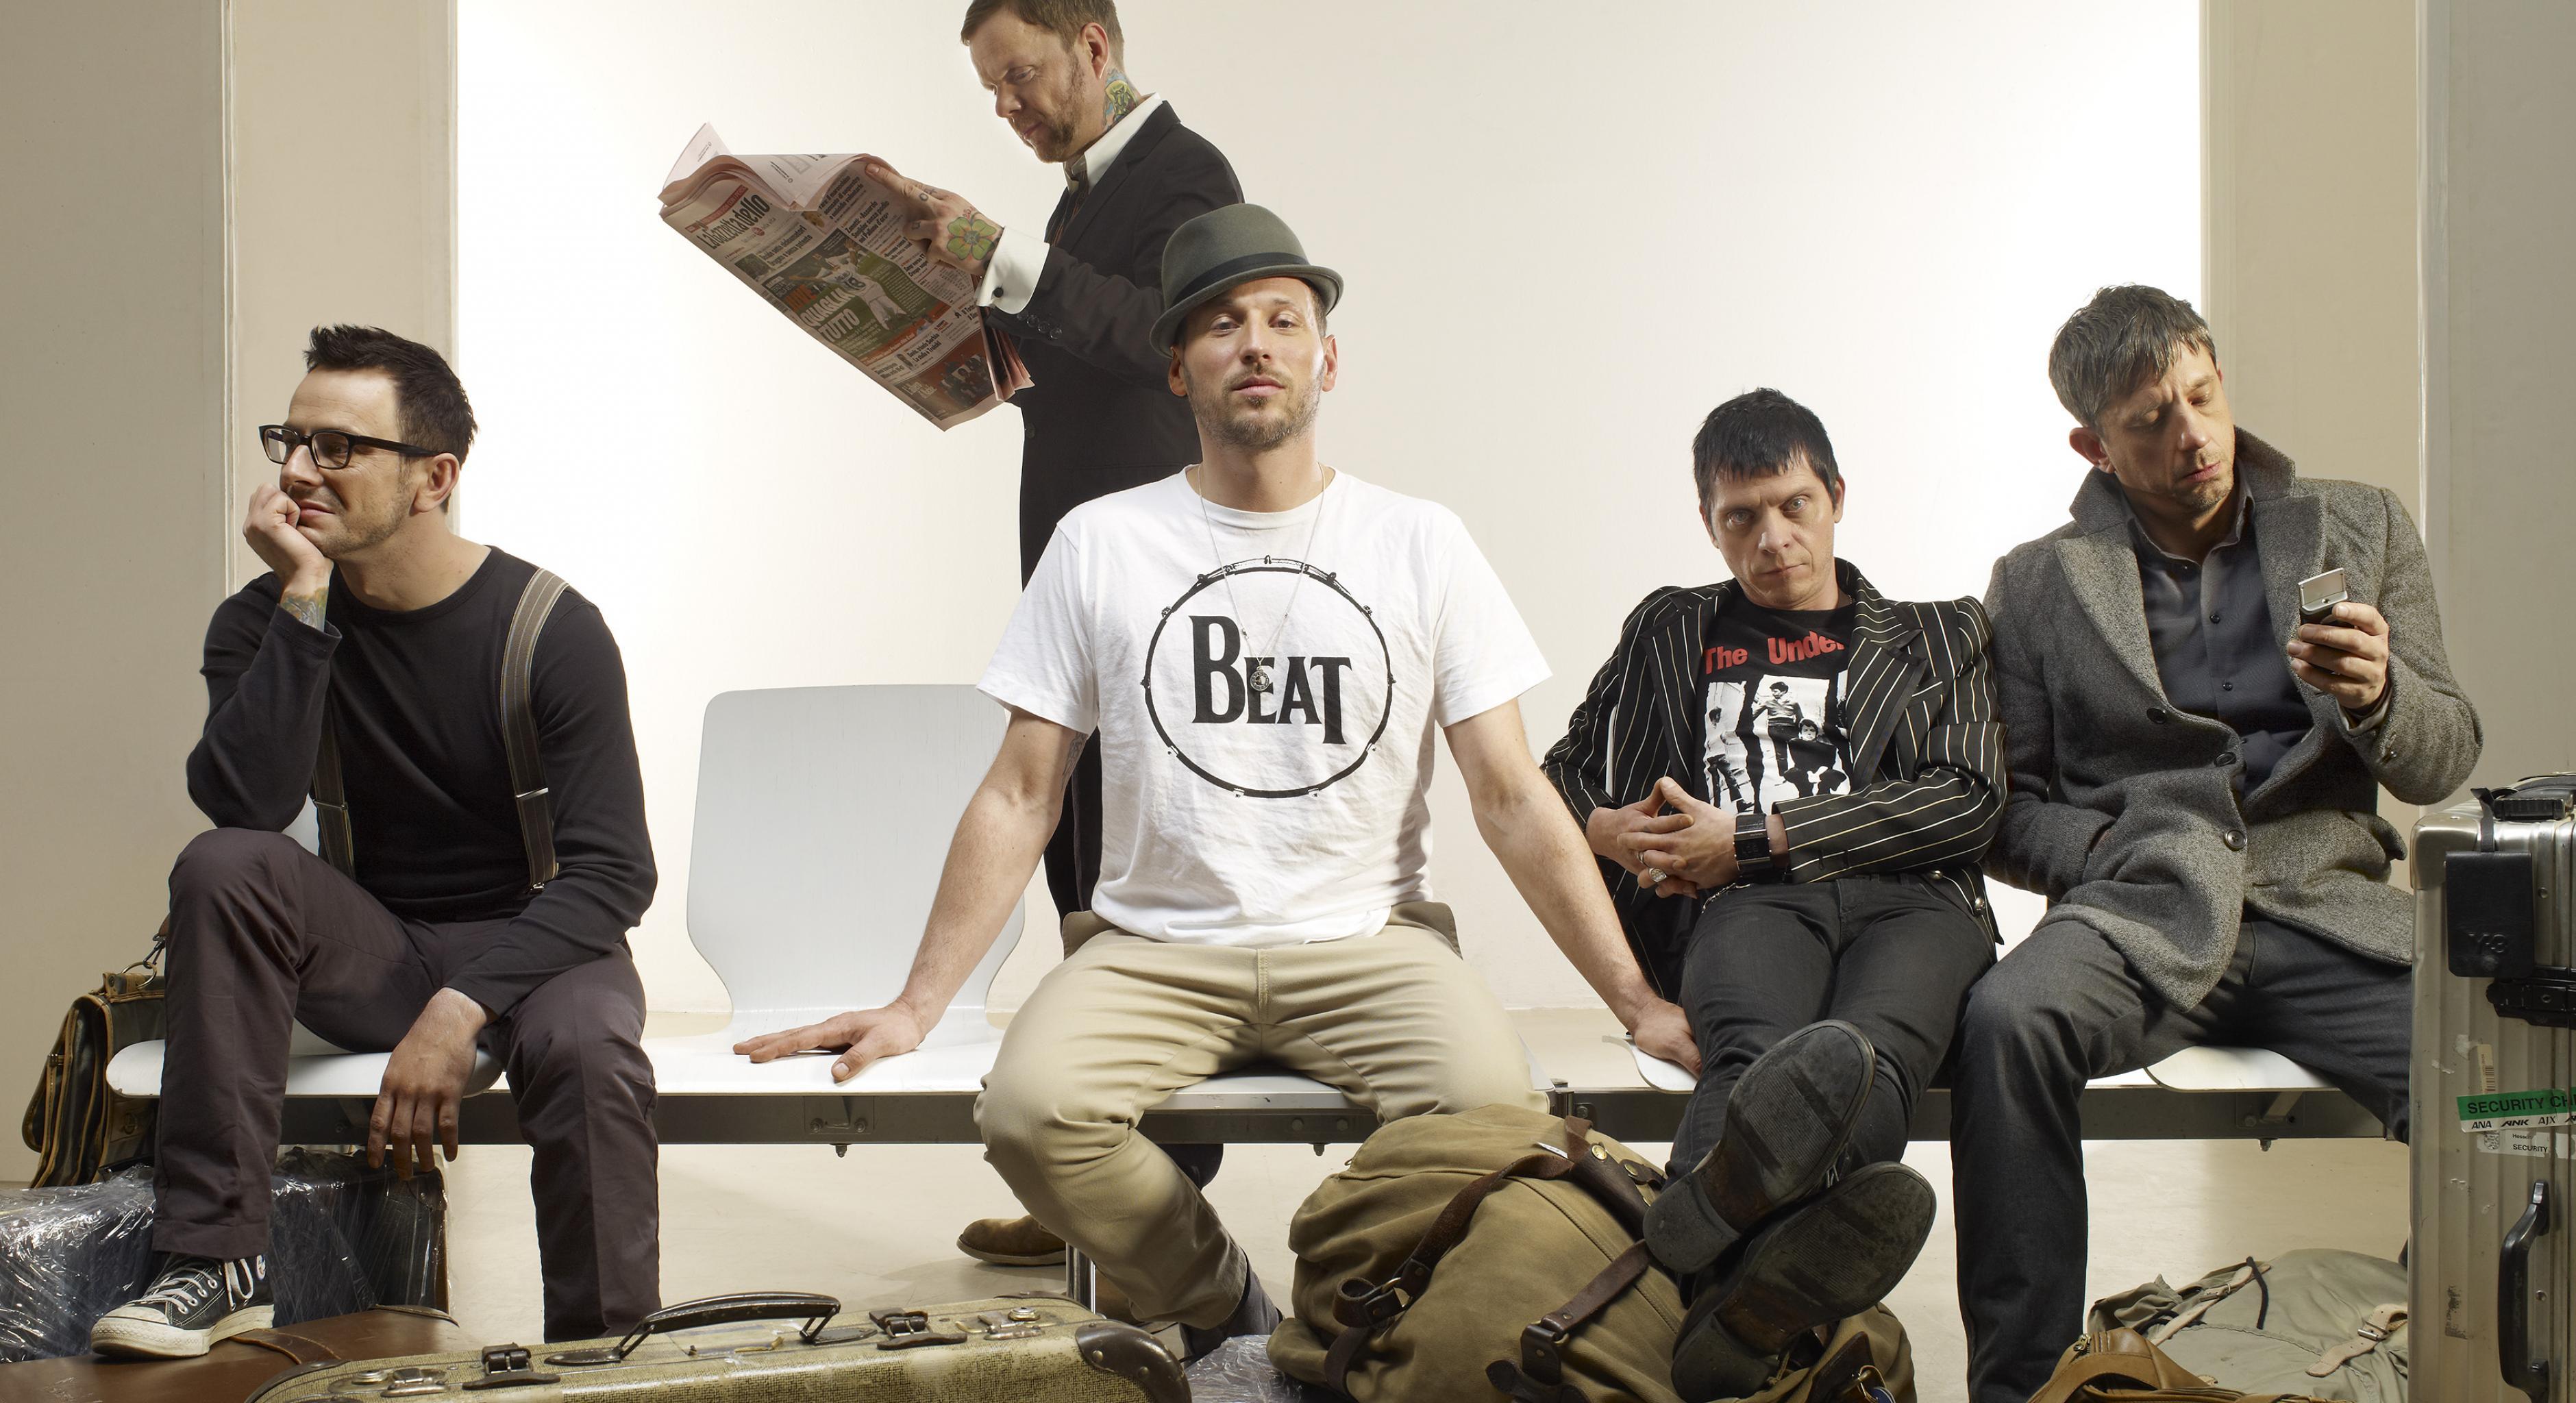 Beatsteaks © Alexander Gnaedinger